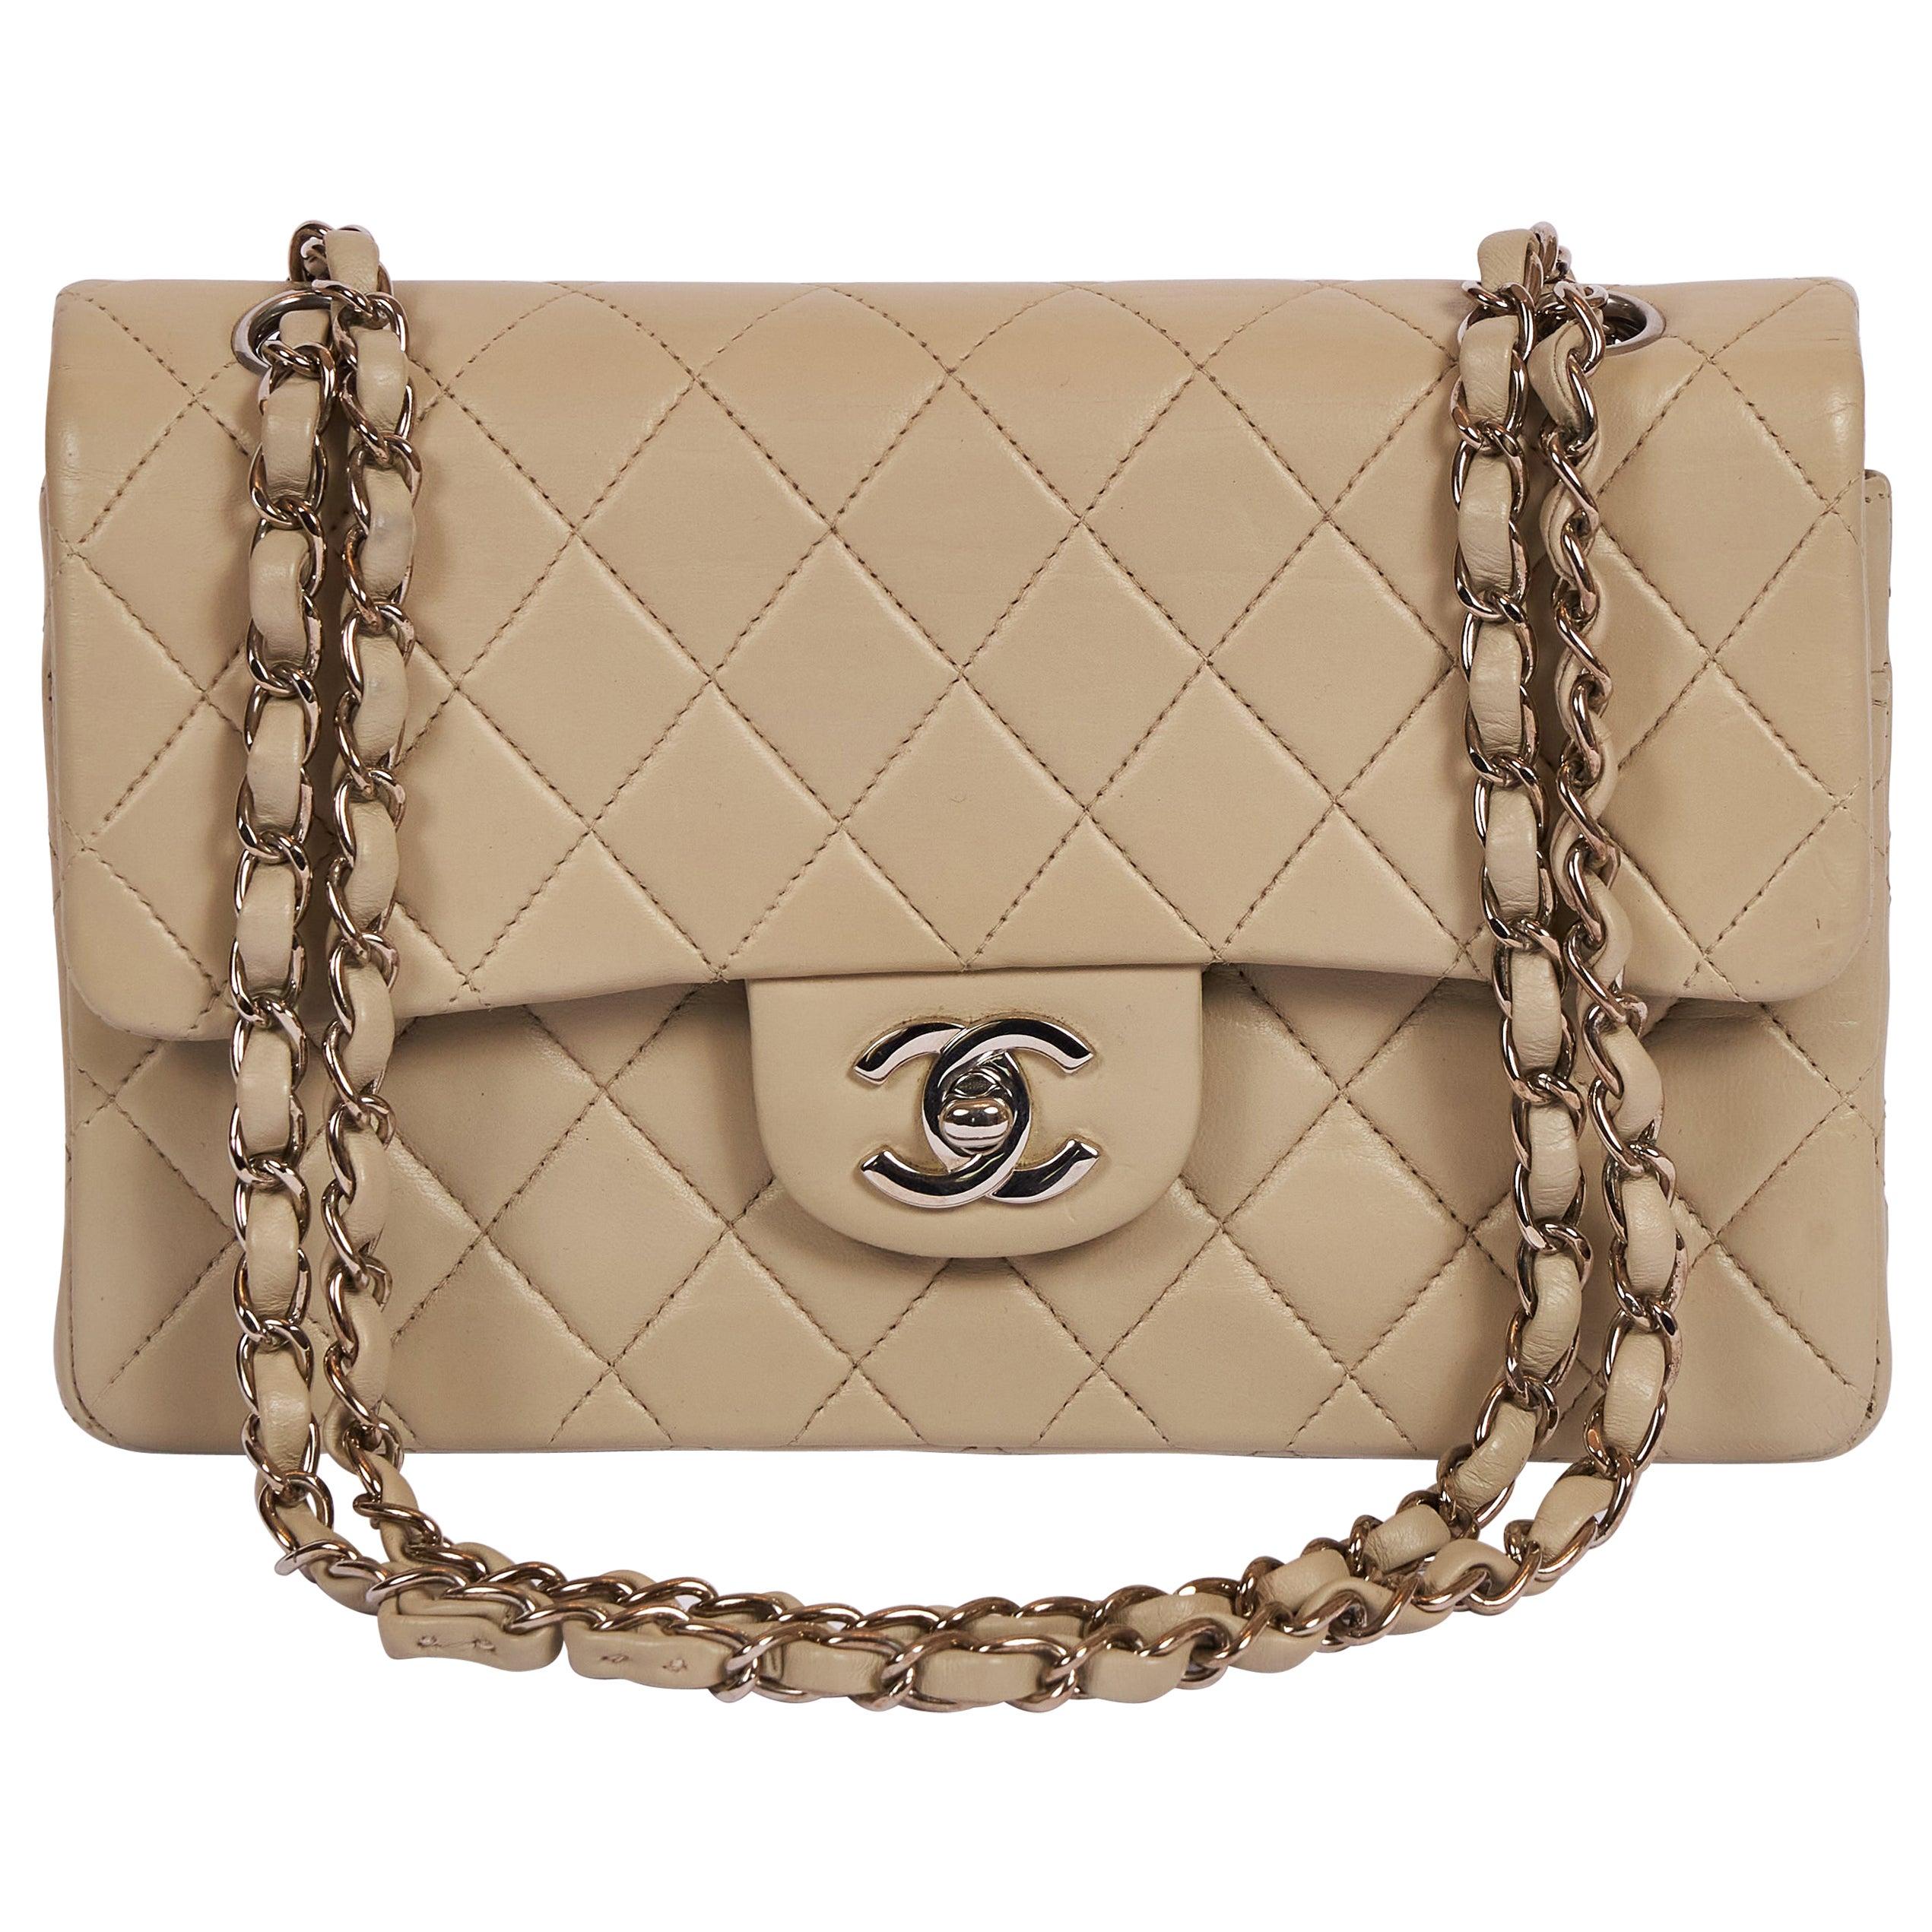 "Chanel Grey Cream 9"" Double Flap Silver Hardware Bag"